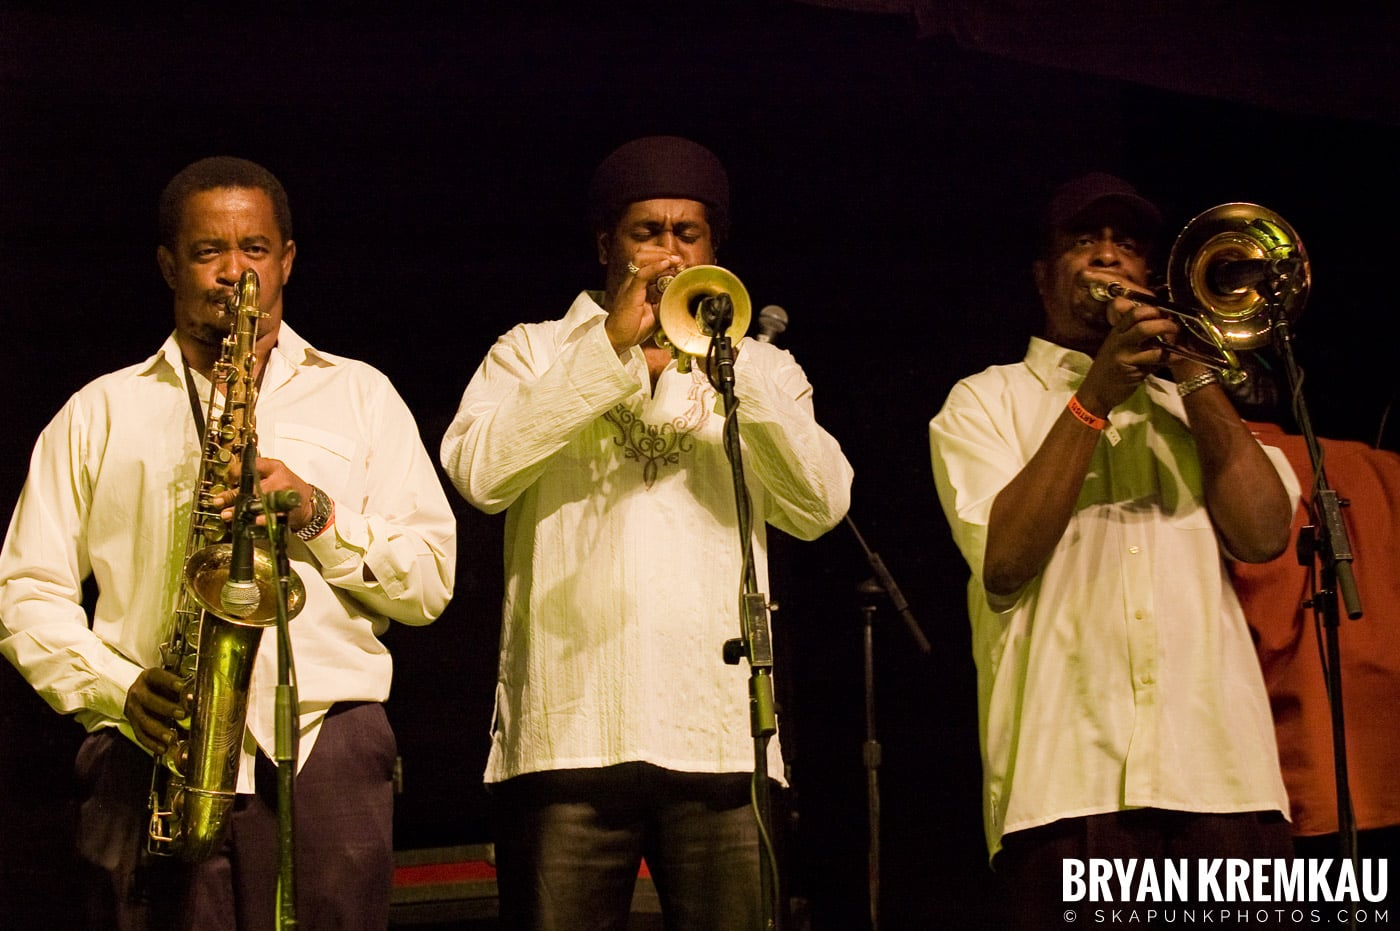 Lloyd Parks @ Vintage Reggae Fest - Hammerstein Ballroom, NYC - 12.16.2007 (5)